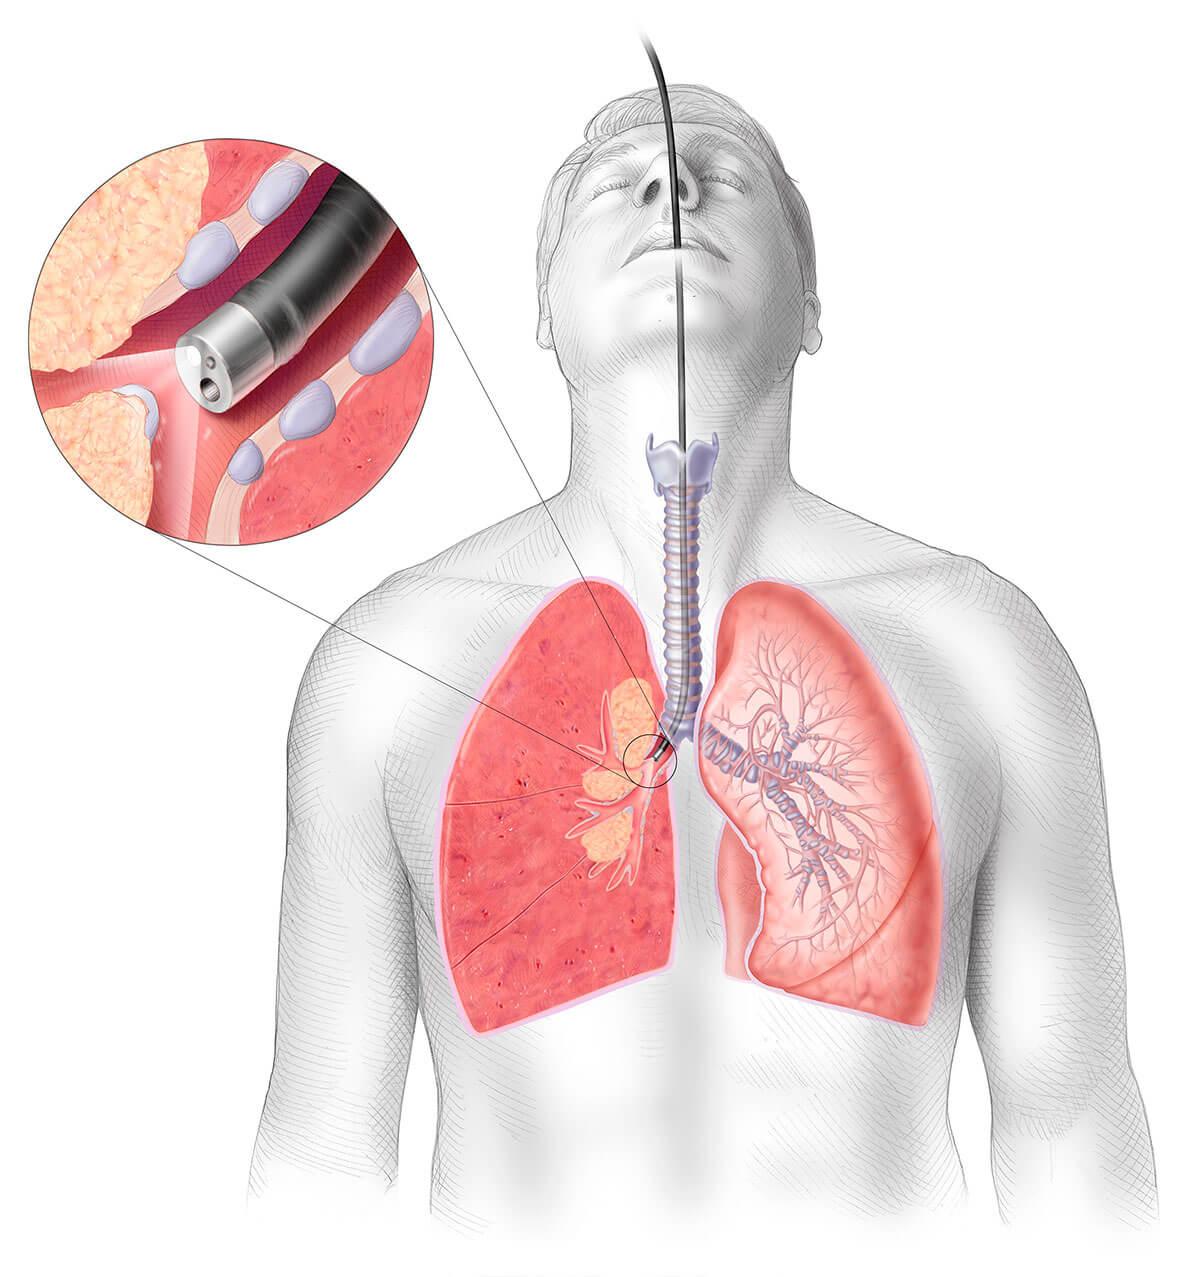 brystkreft spredning skjelett symptomer